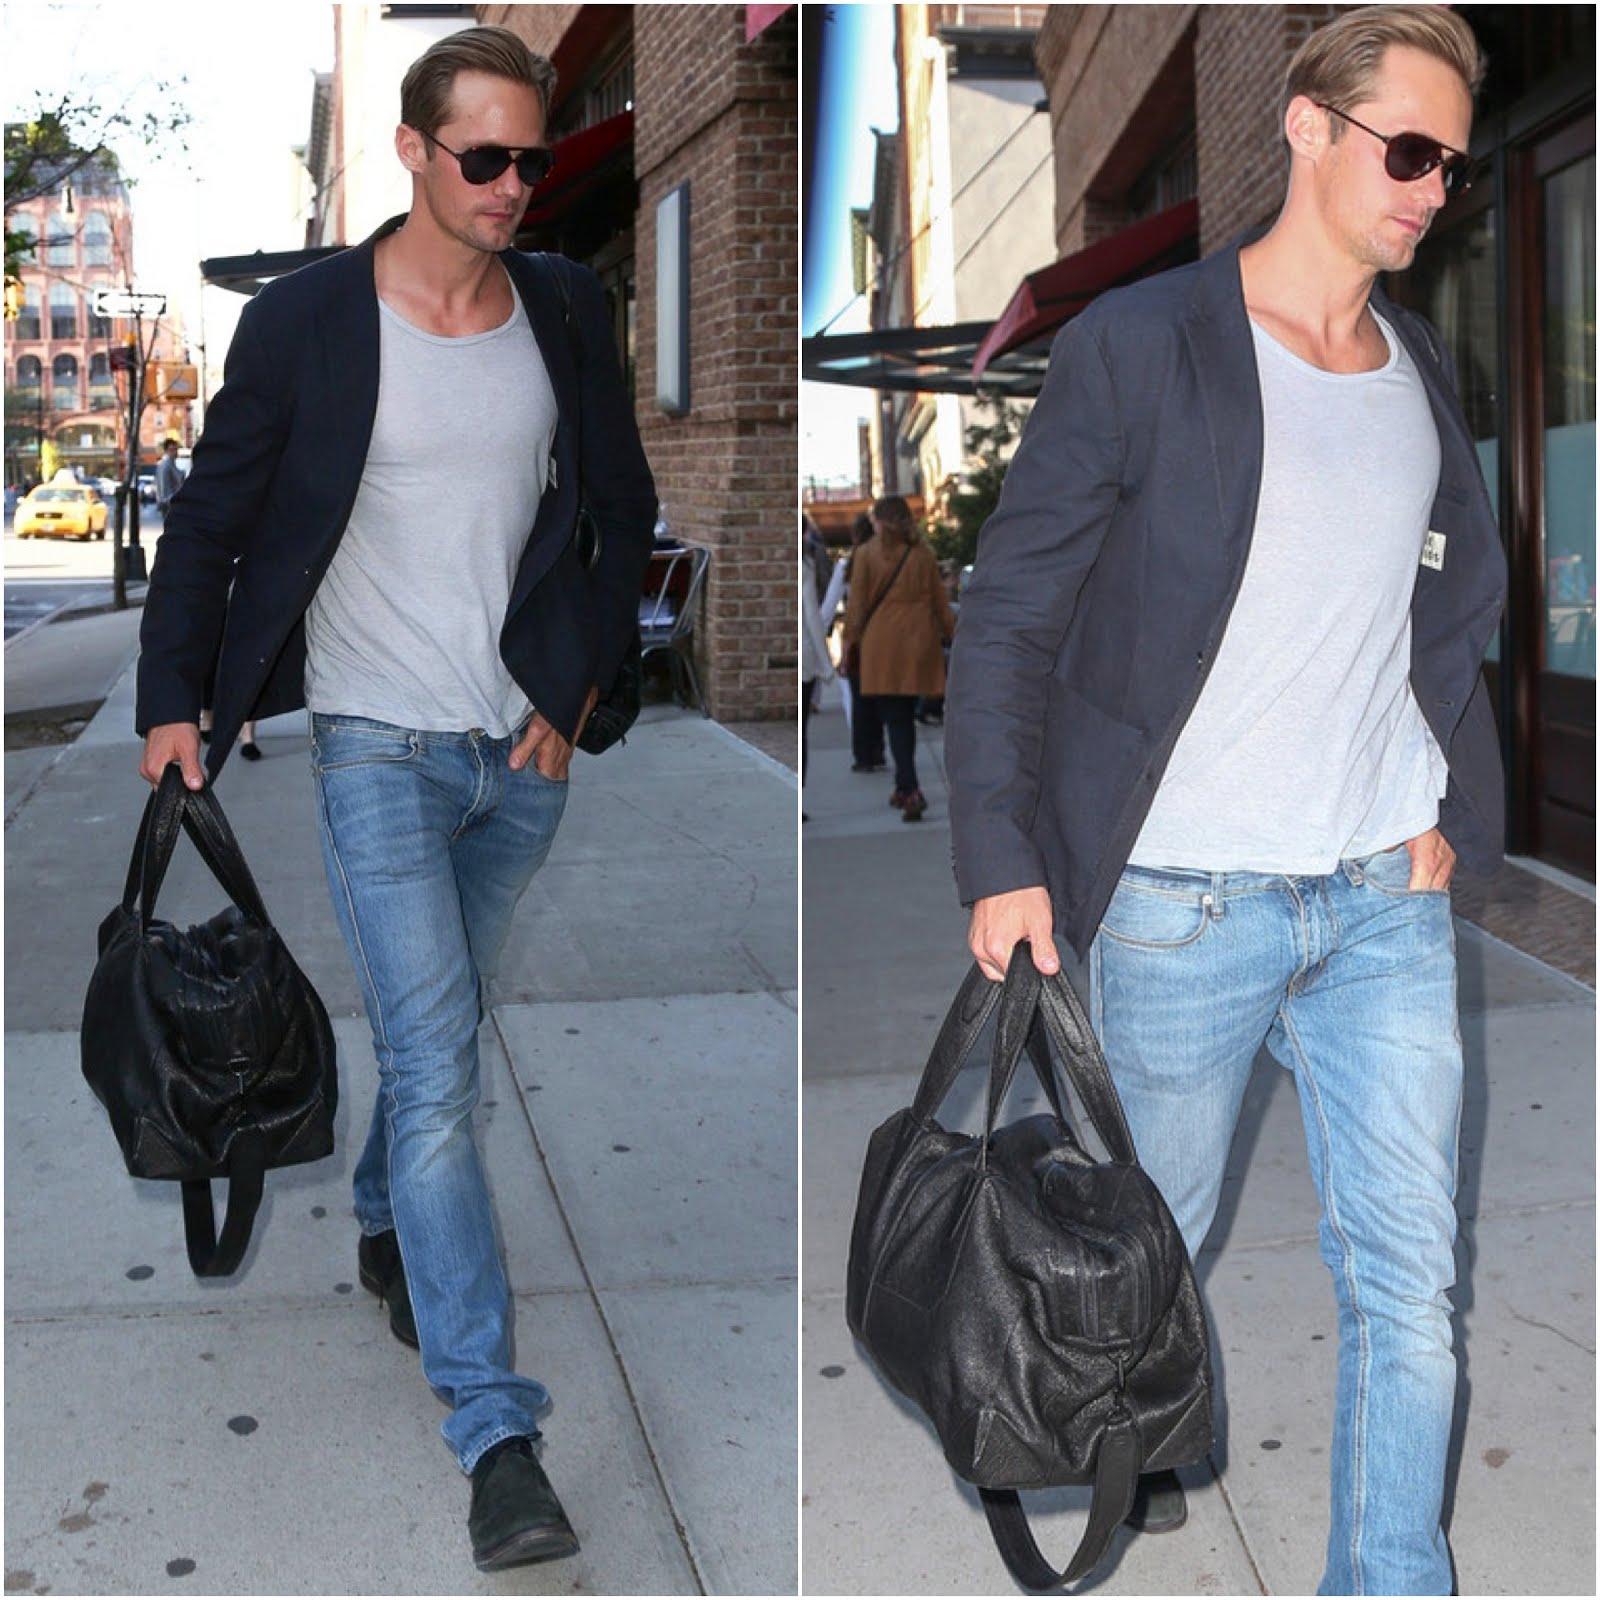 00O00 Menswear Blog: Alexander Skarsgard's Alexander Wang 'Wallie' Duffle - New York Street Style May 2013